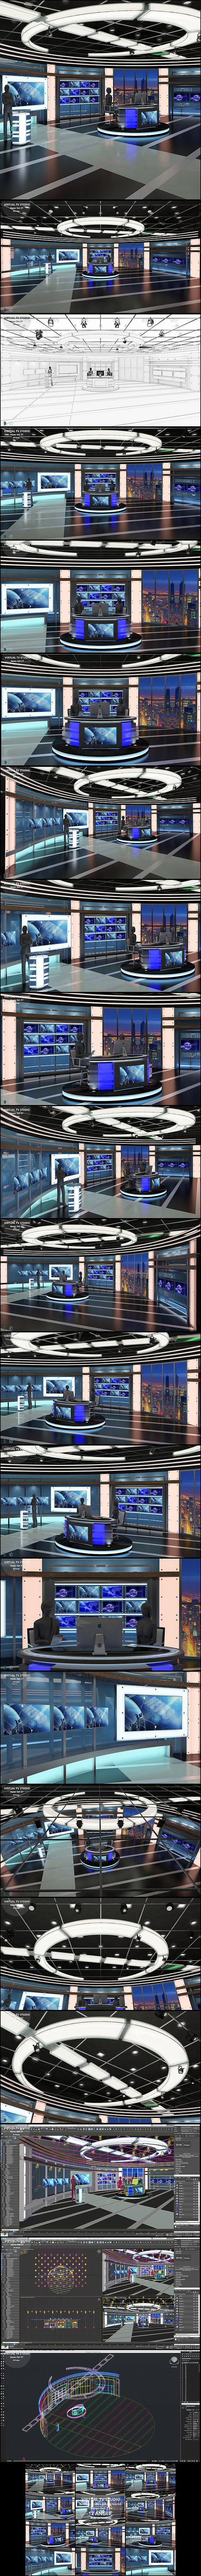 Virtual TV Studio News Set 27 - 3D Model Designs